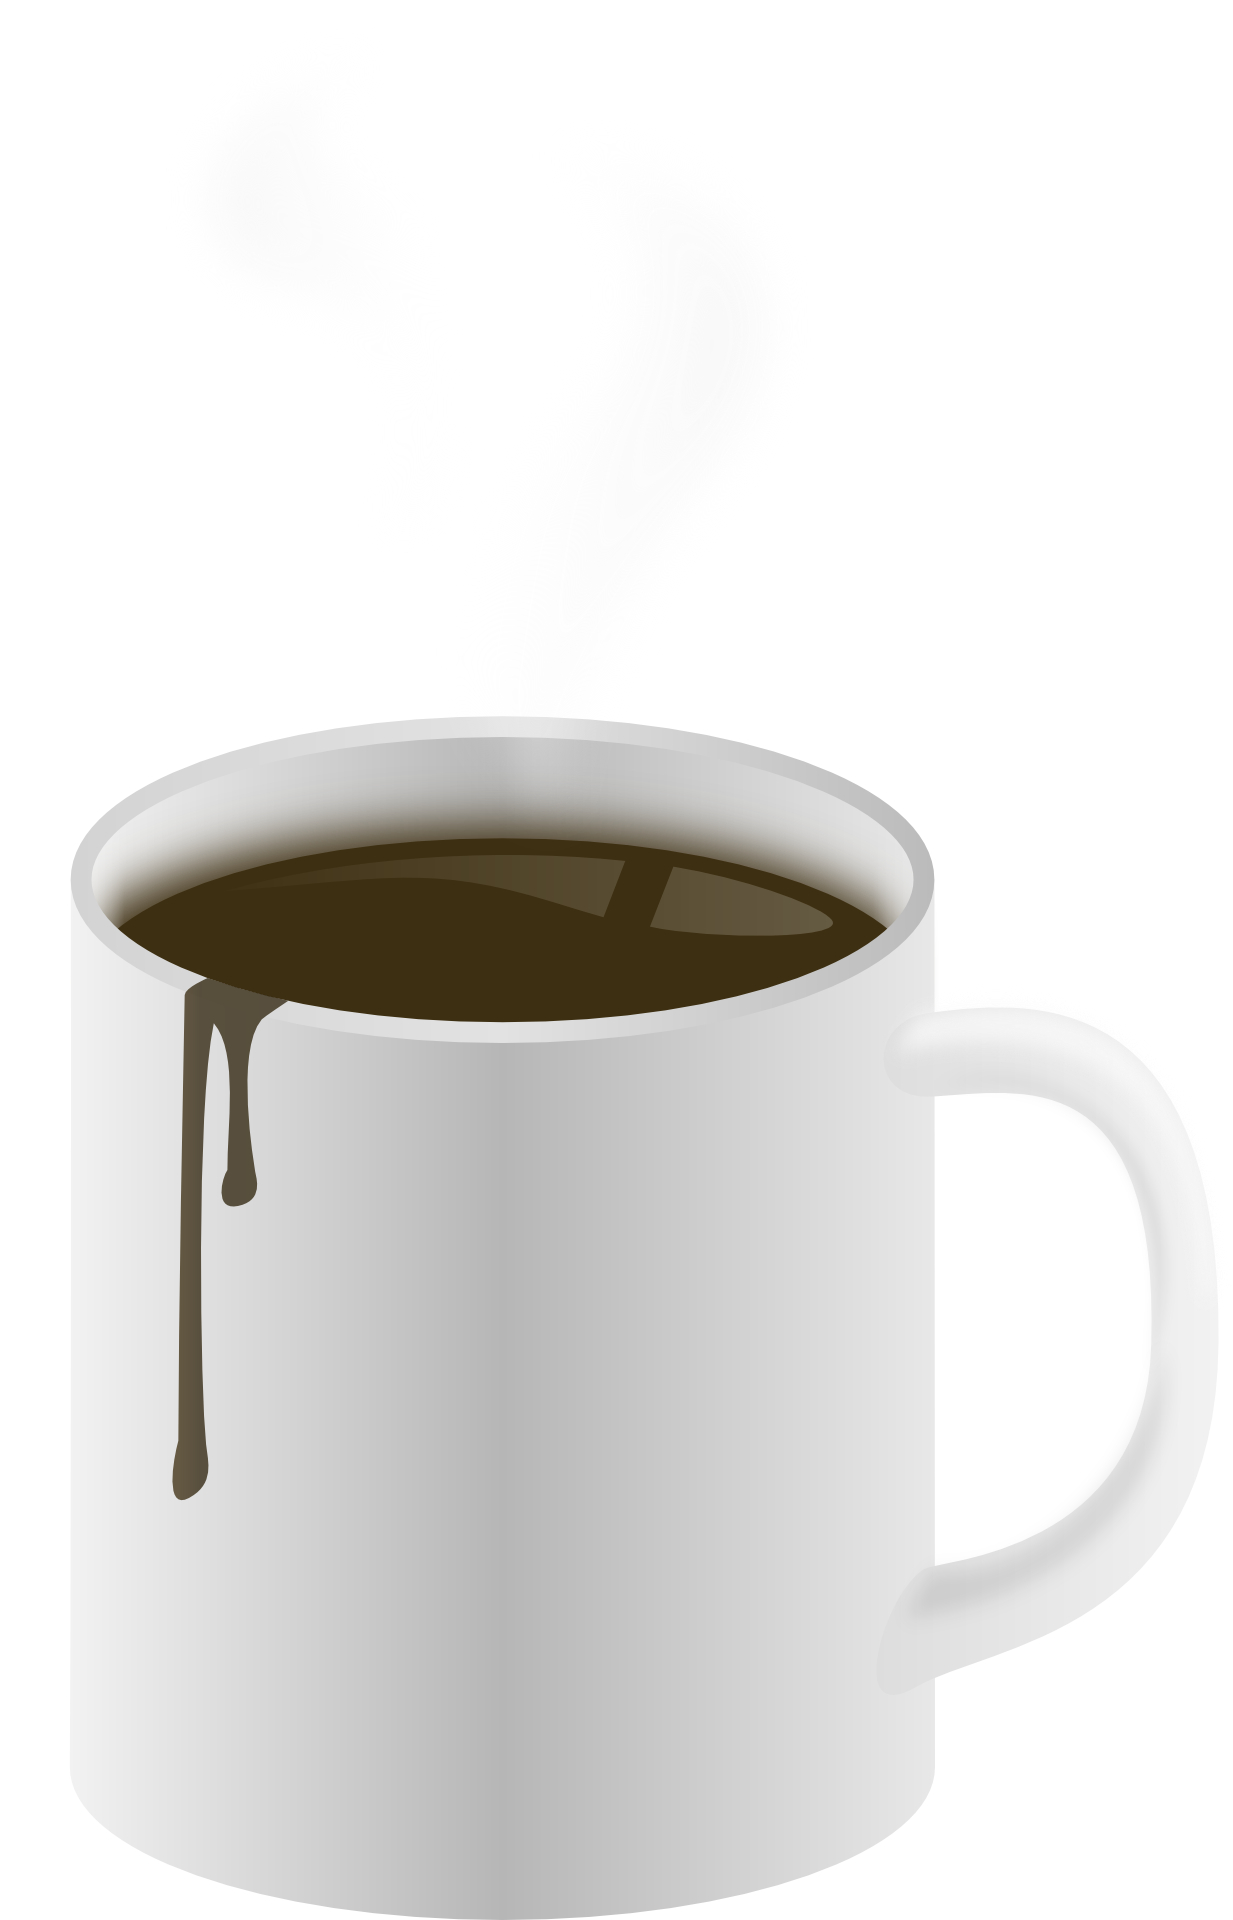 Coffee cup,mug vector,drink,coffee